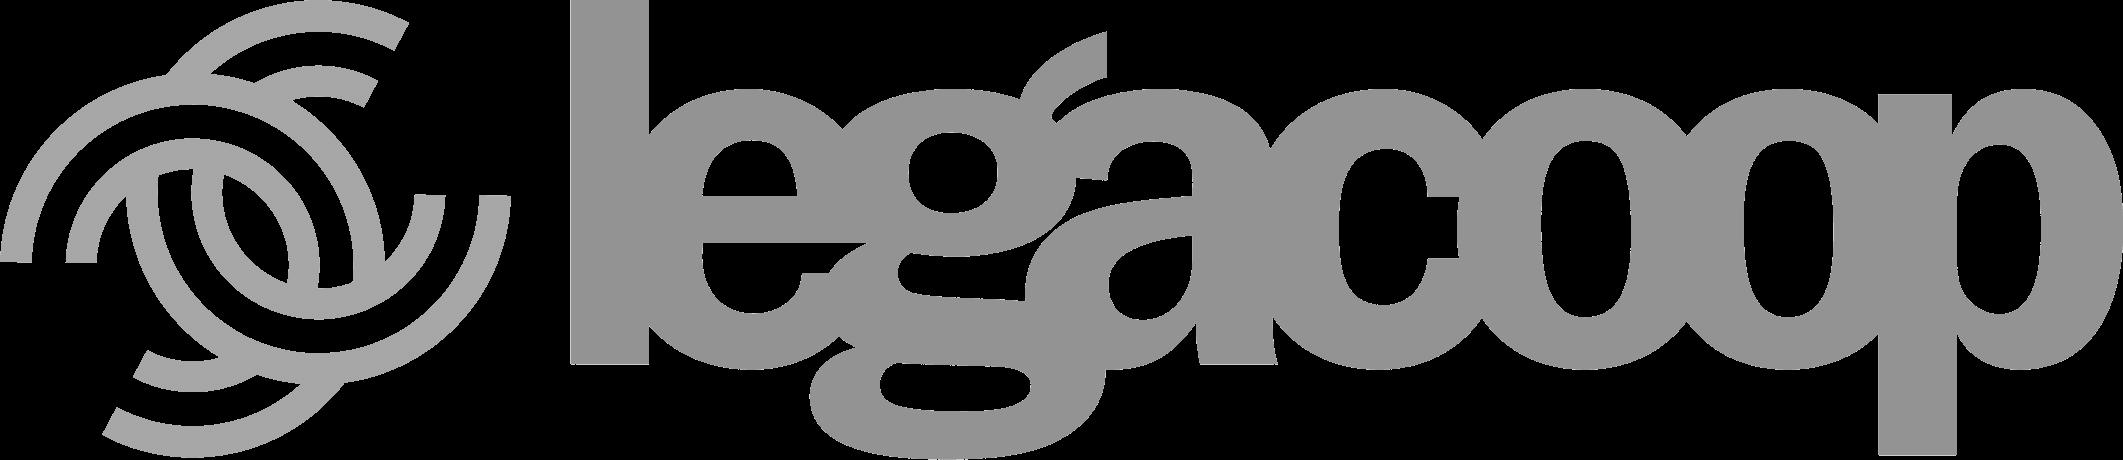 legacoop_logo